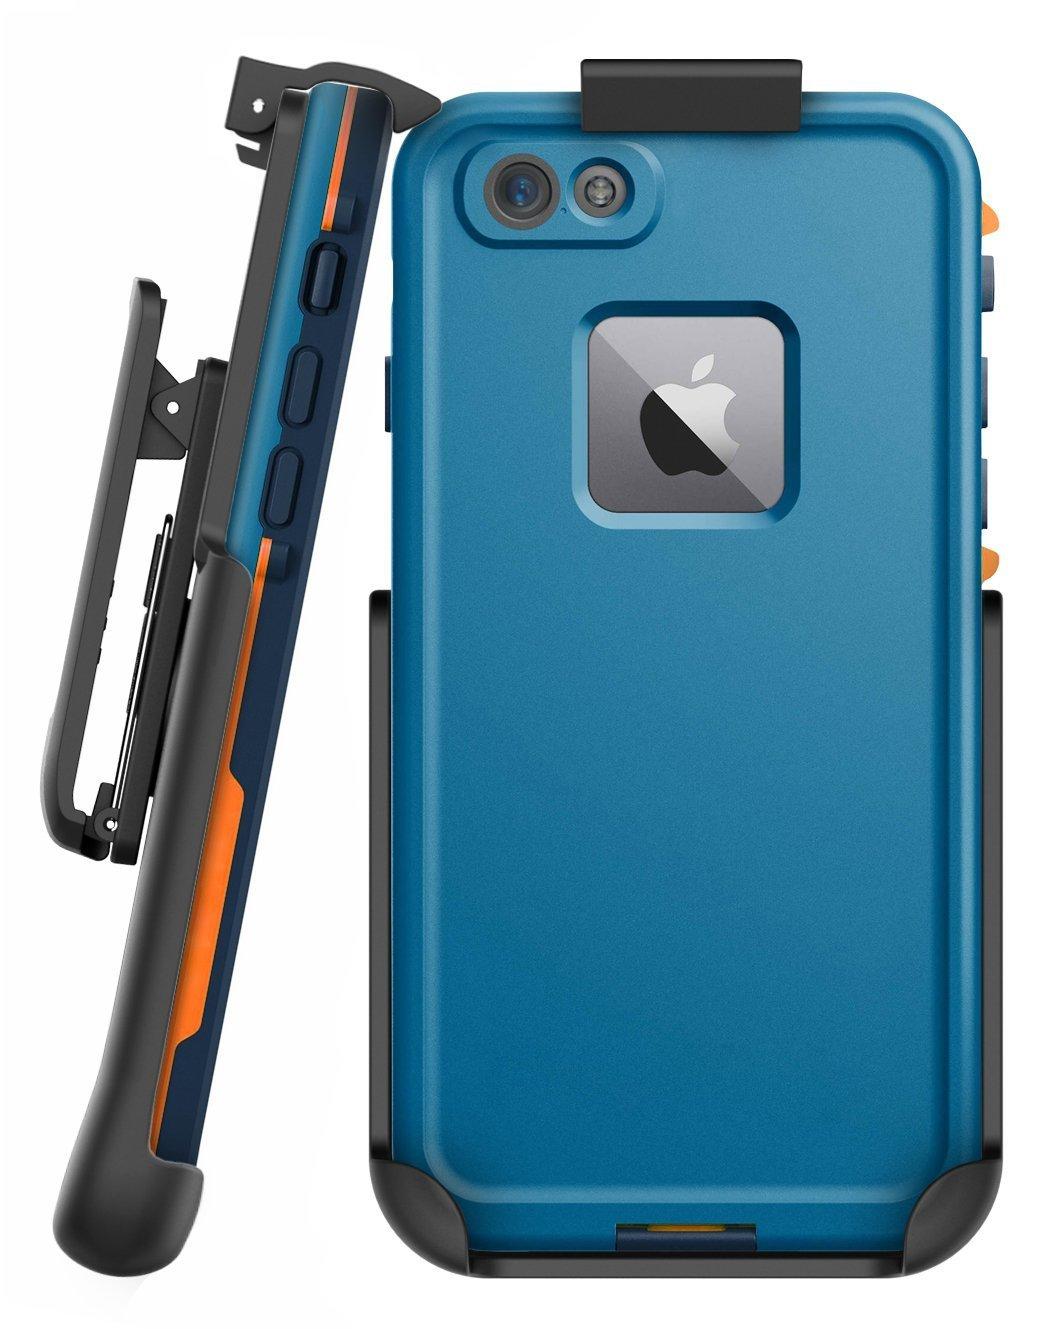 Encased Belt Clip Holster for LifeProof FRE Case - iPhone 8 (4.7'') (case sold separately)